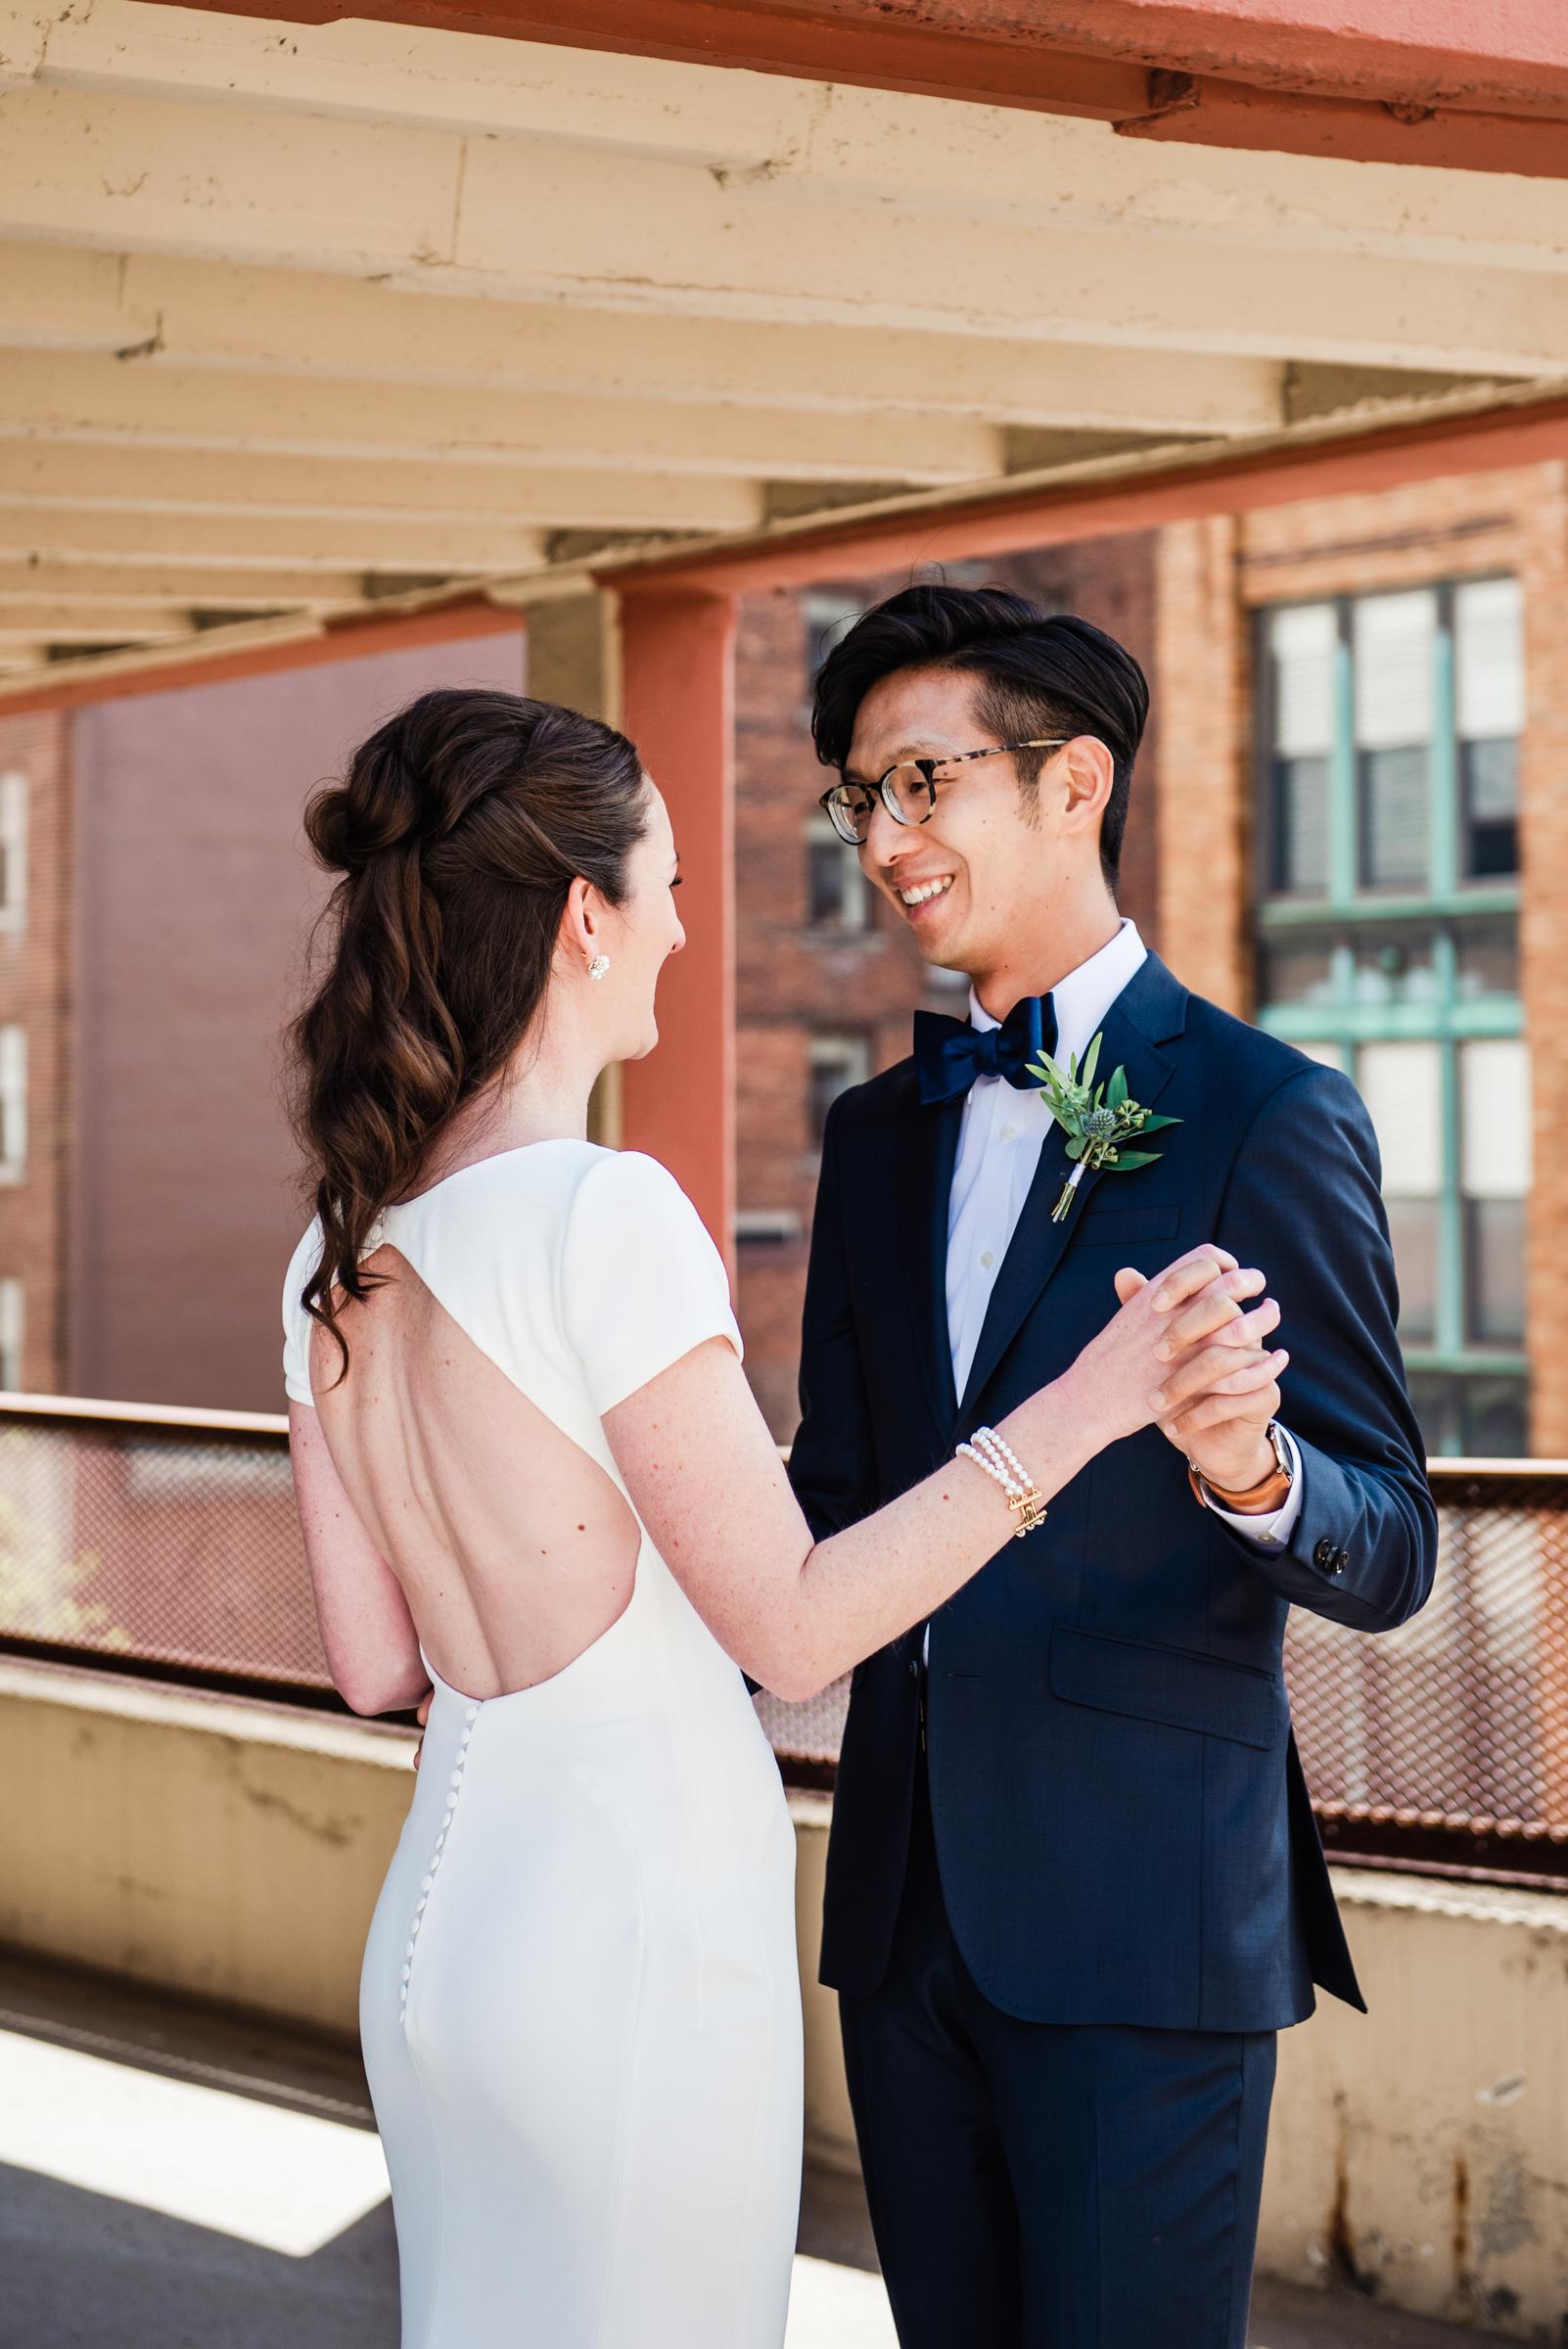 SKY_Armory_Syracuse_Wedding_JILL_STUDIO_Rochester_NY_Photographer_DSC_5201.jpg